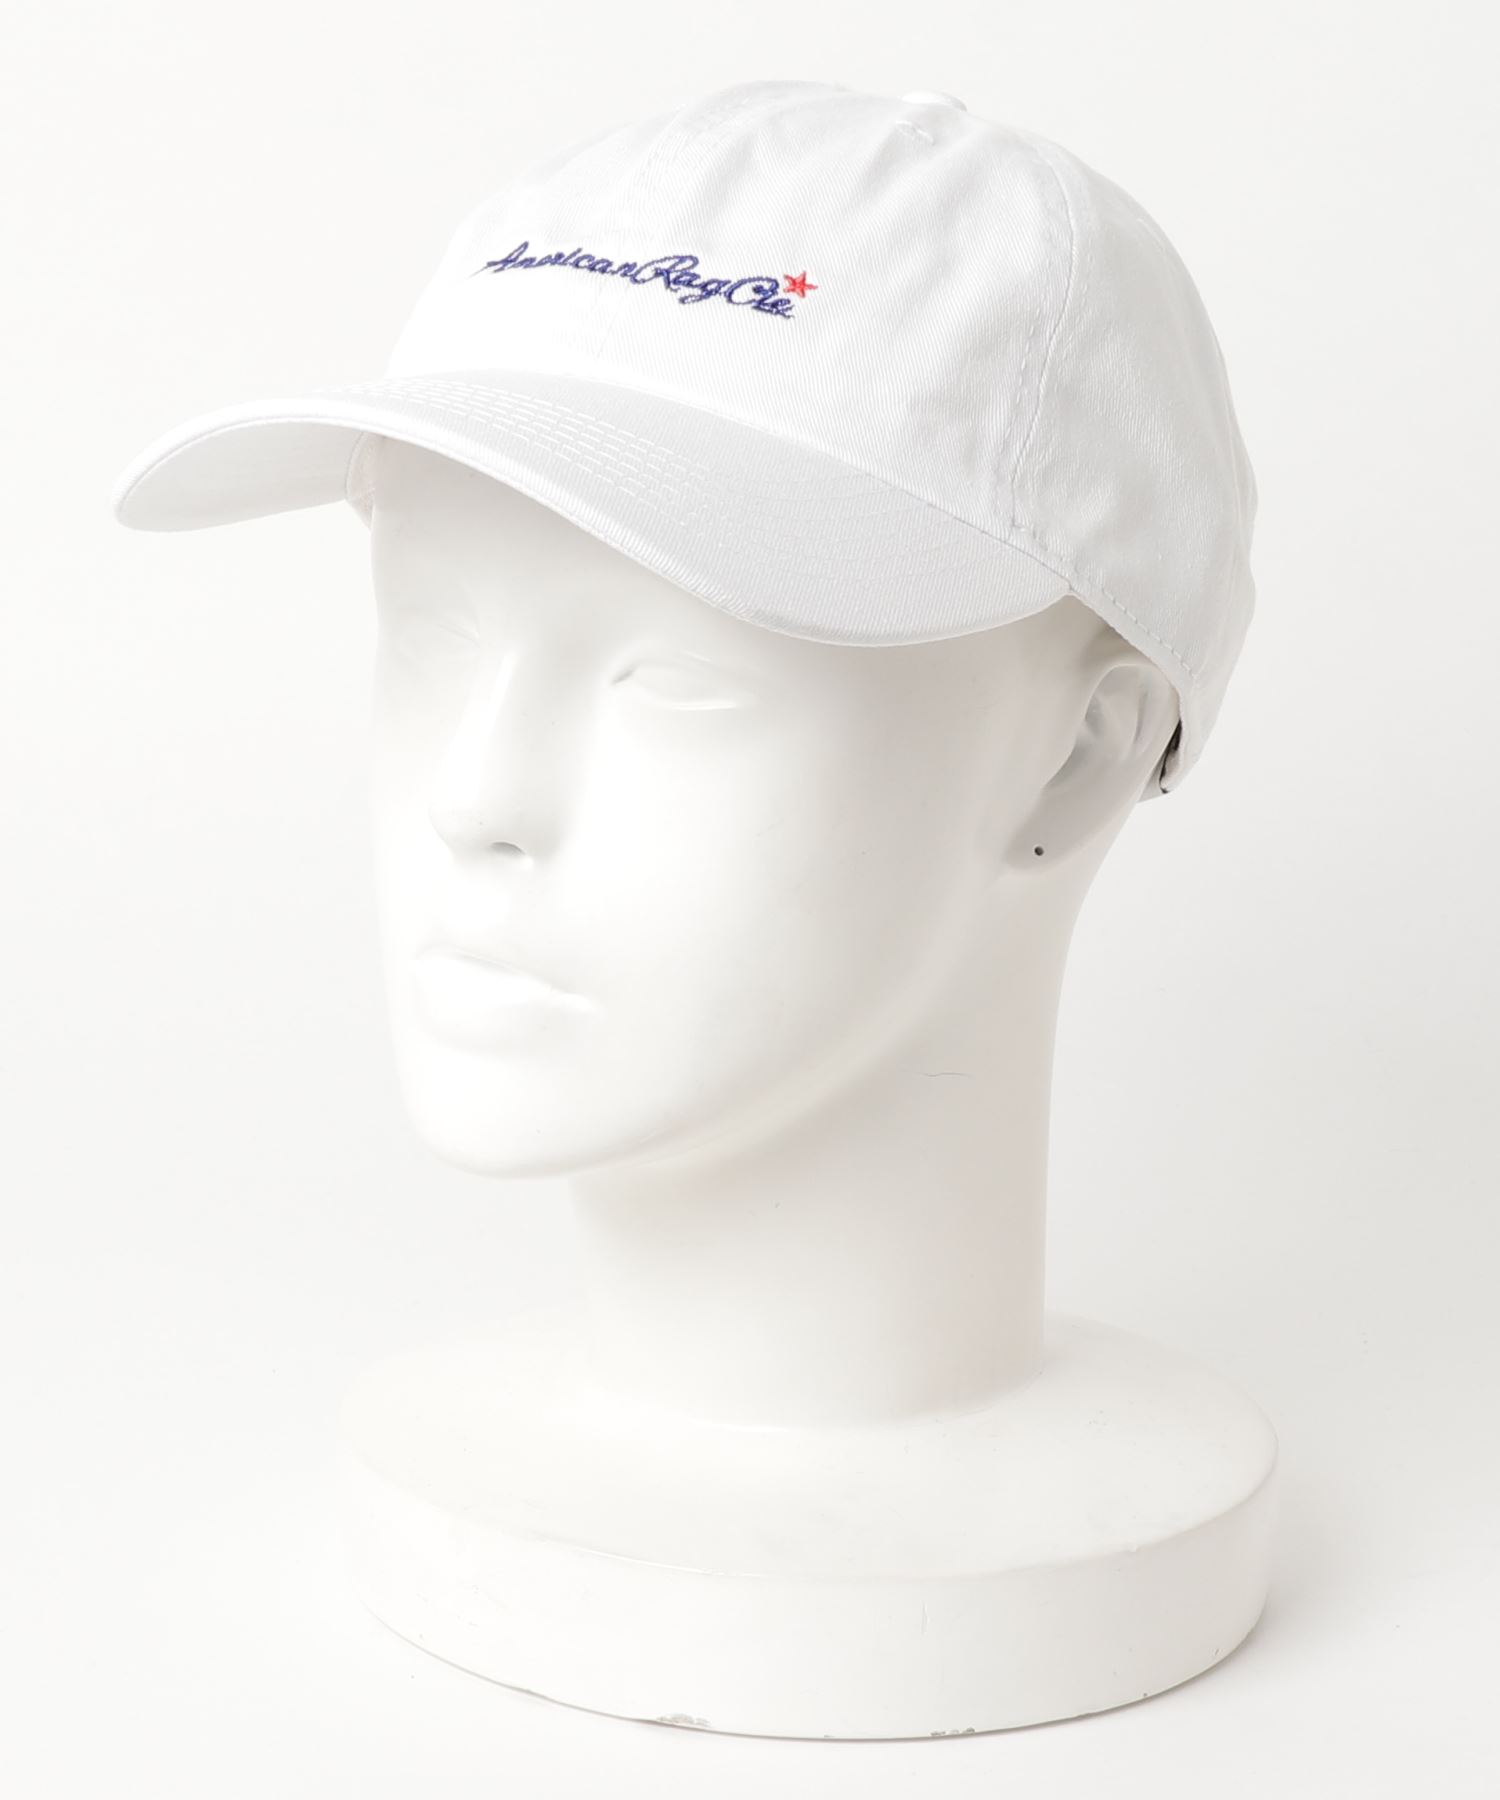 AMERICAN RAG CIE ARC Script Logo Embroidery Cotton Twill Cap/アメリカンラグシー ARCスクリプトロゴエンブロイダリーコットンツイルキャップ